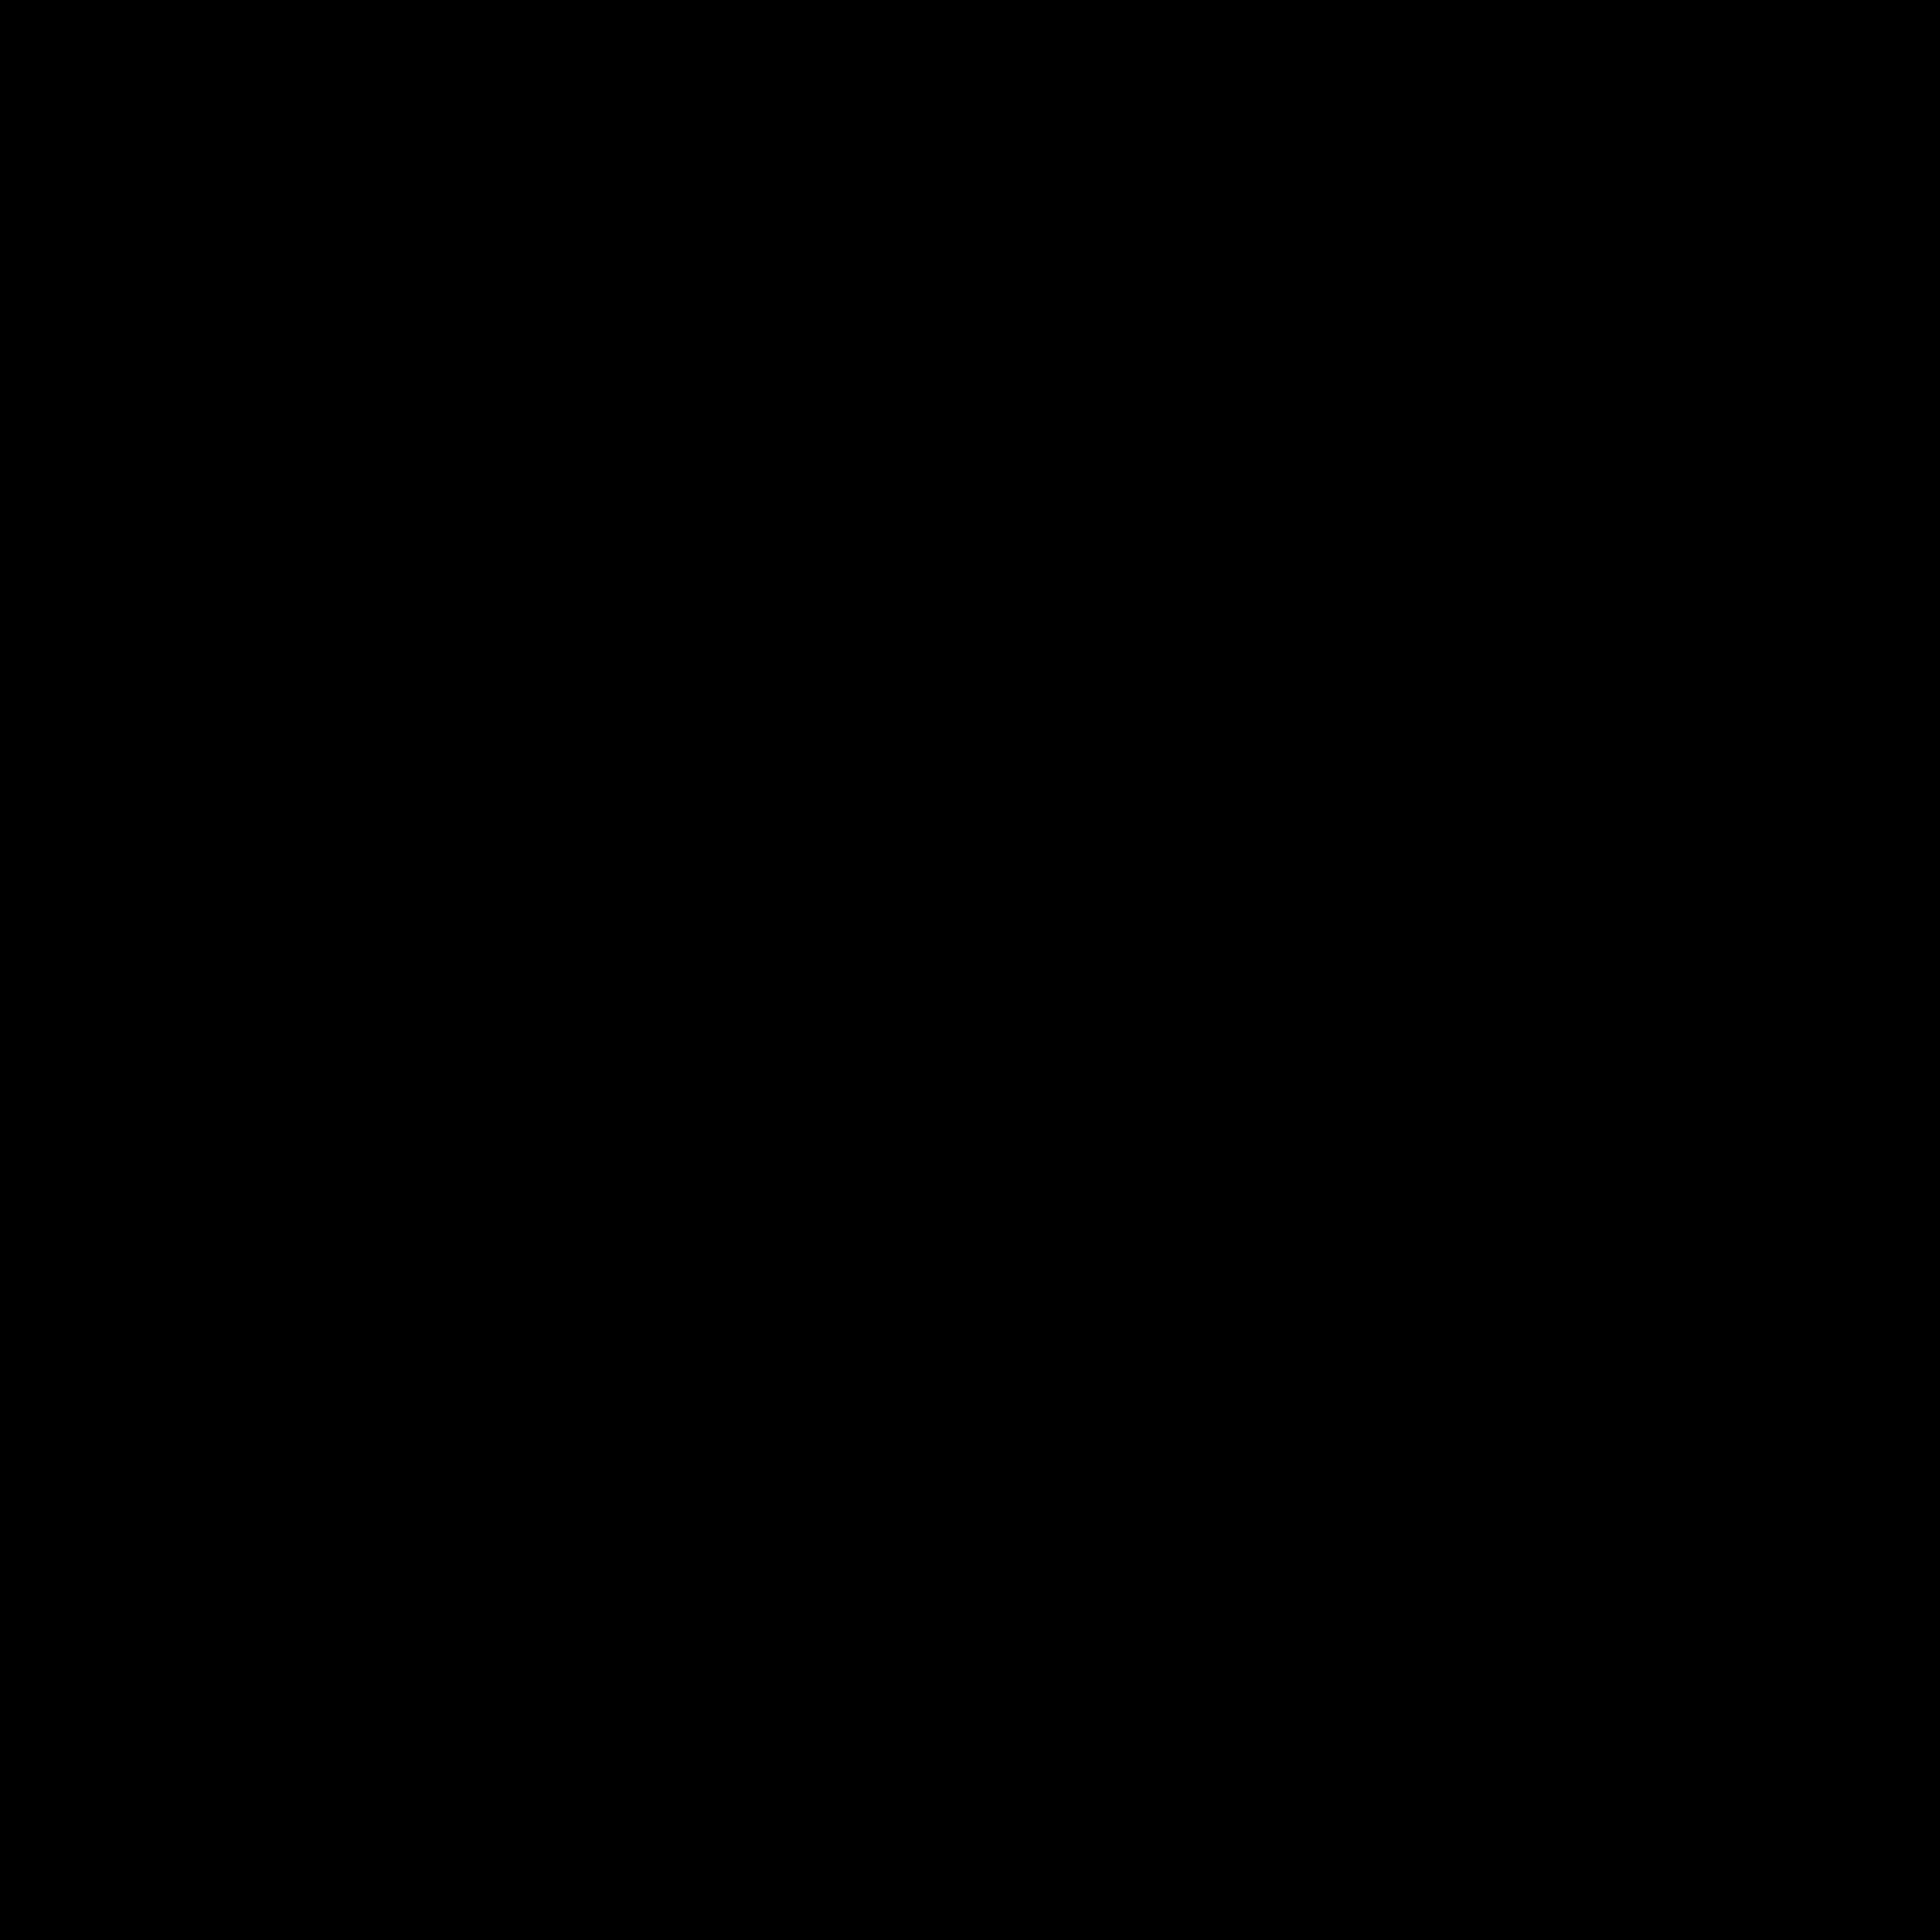 asus-6630-logo-png-transparent.png